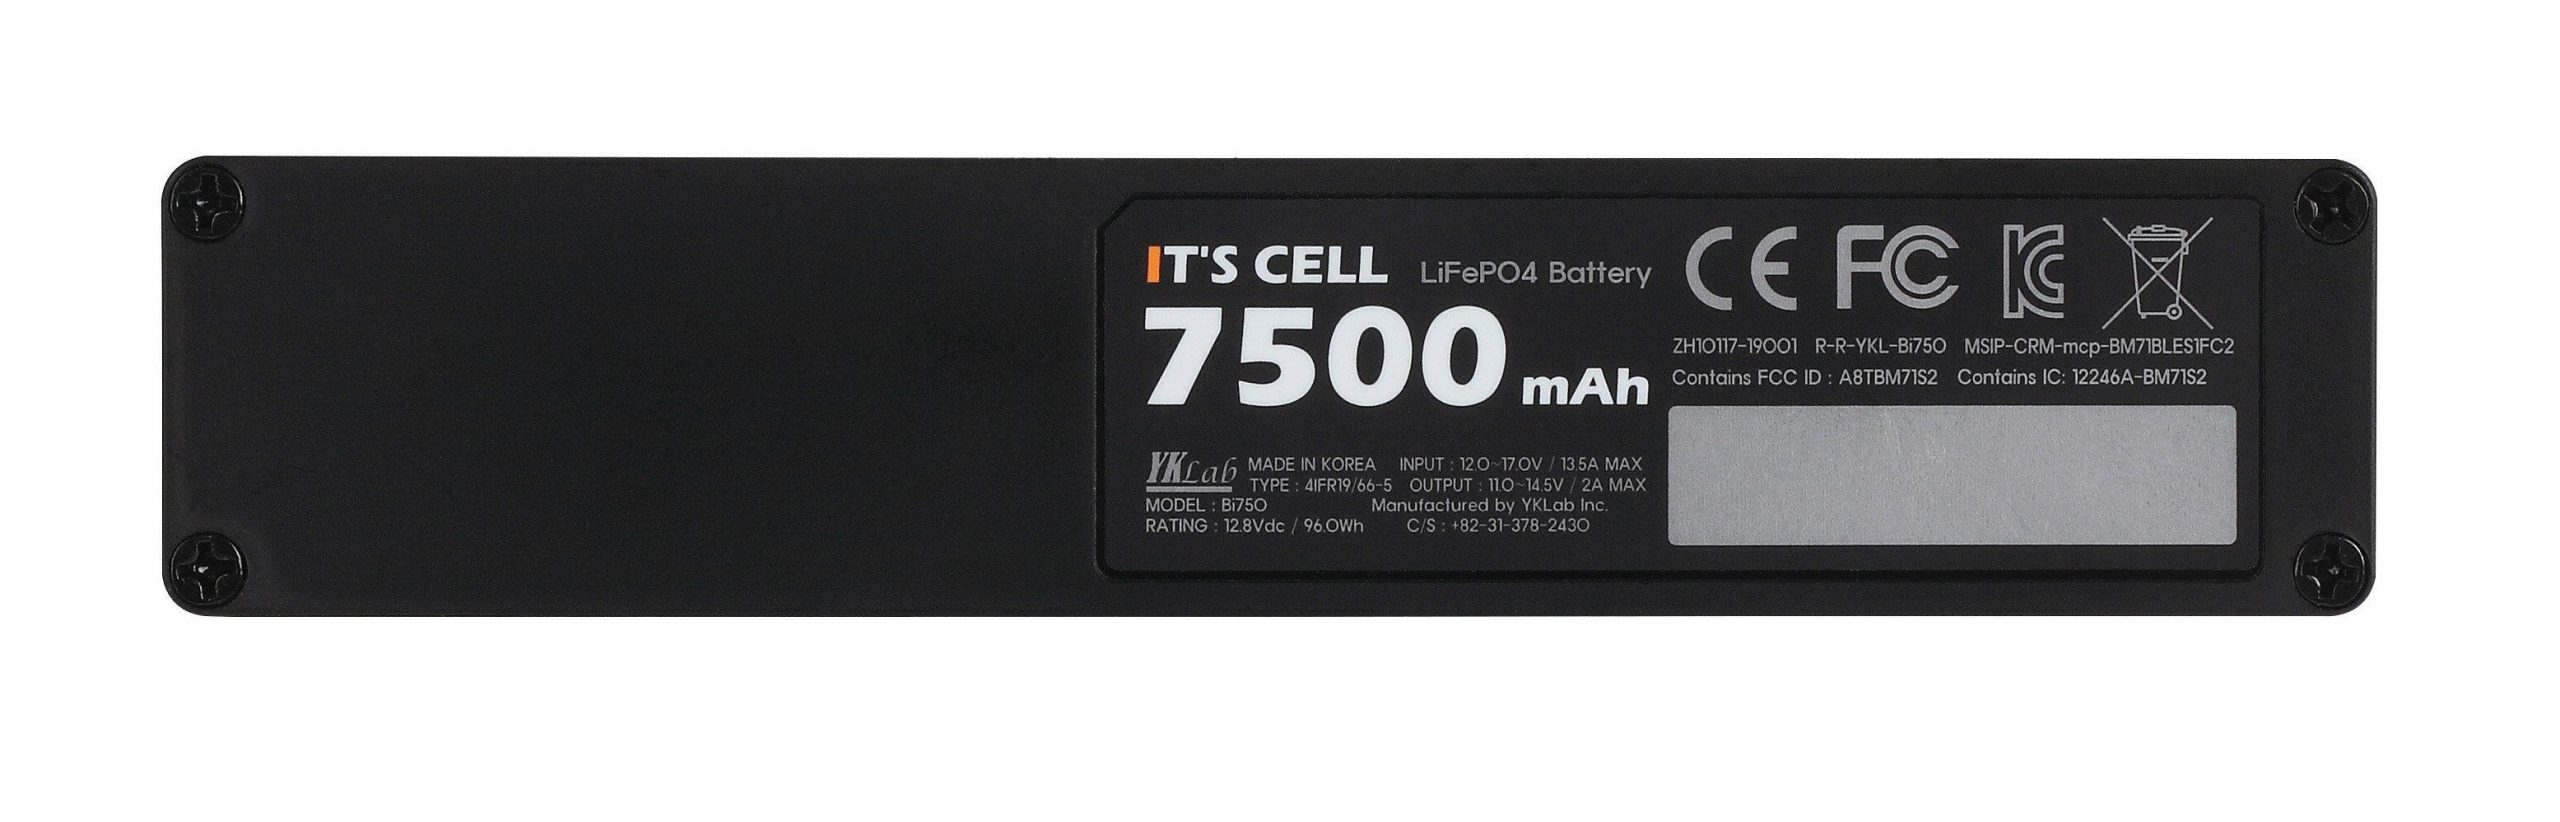 It's Cell Bi-750 Battery Pack